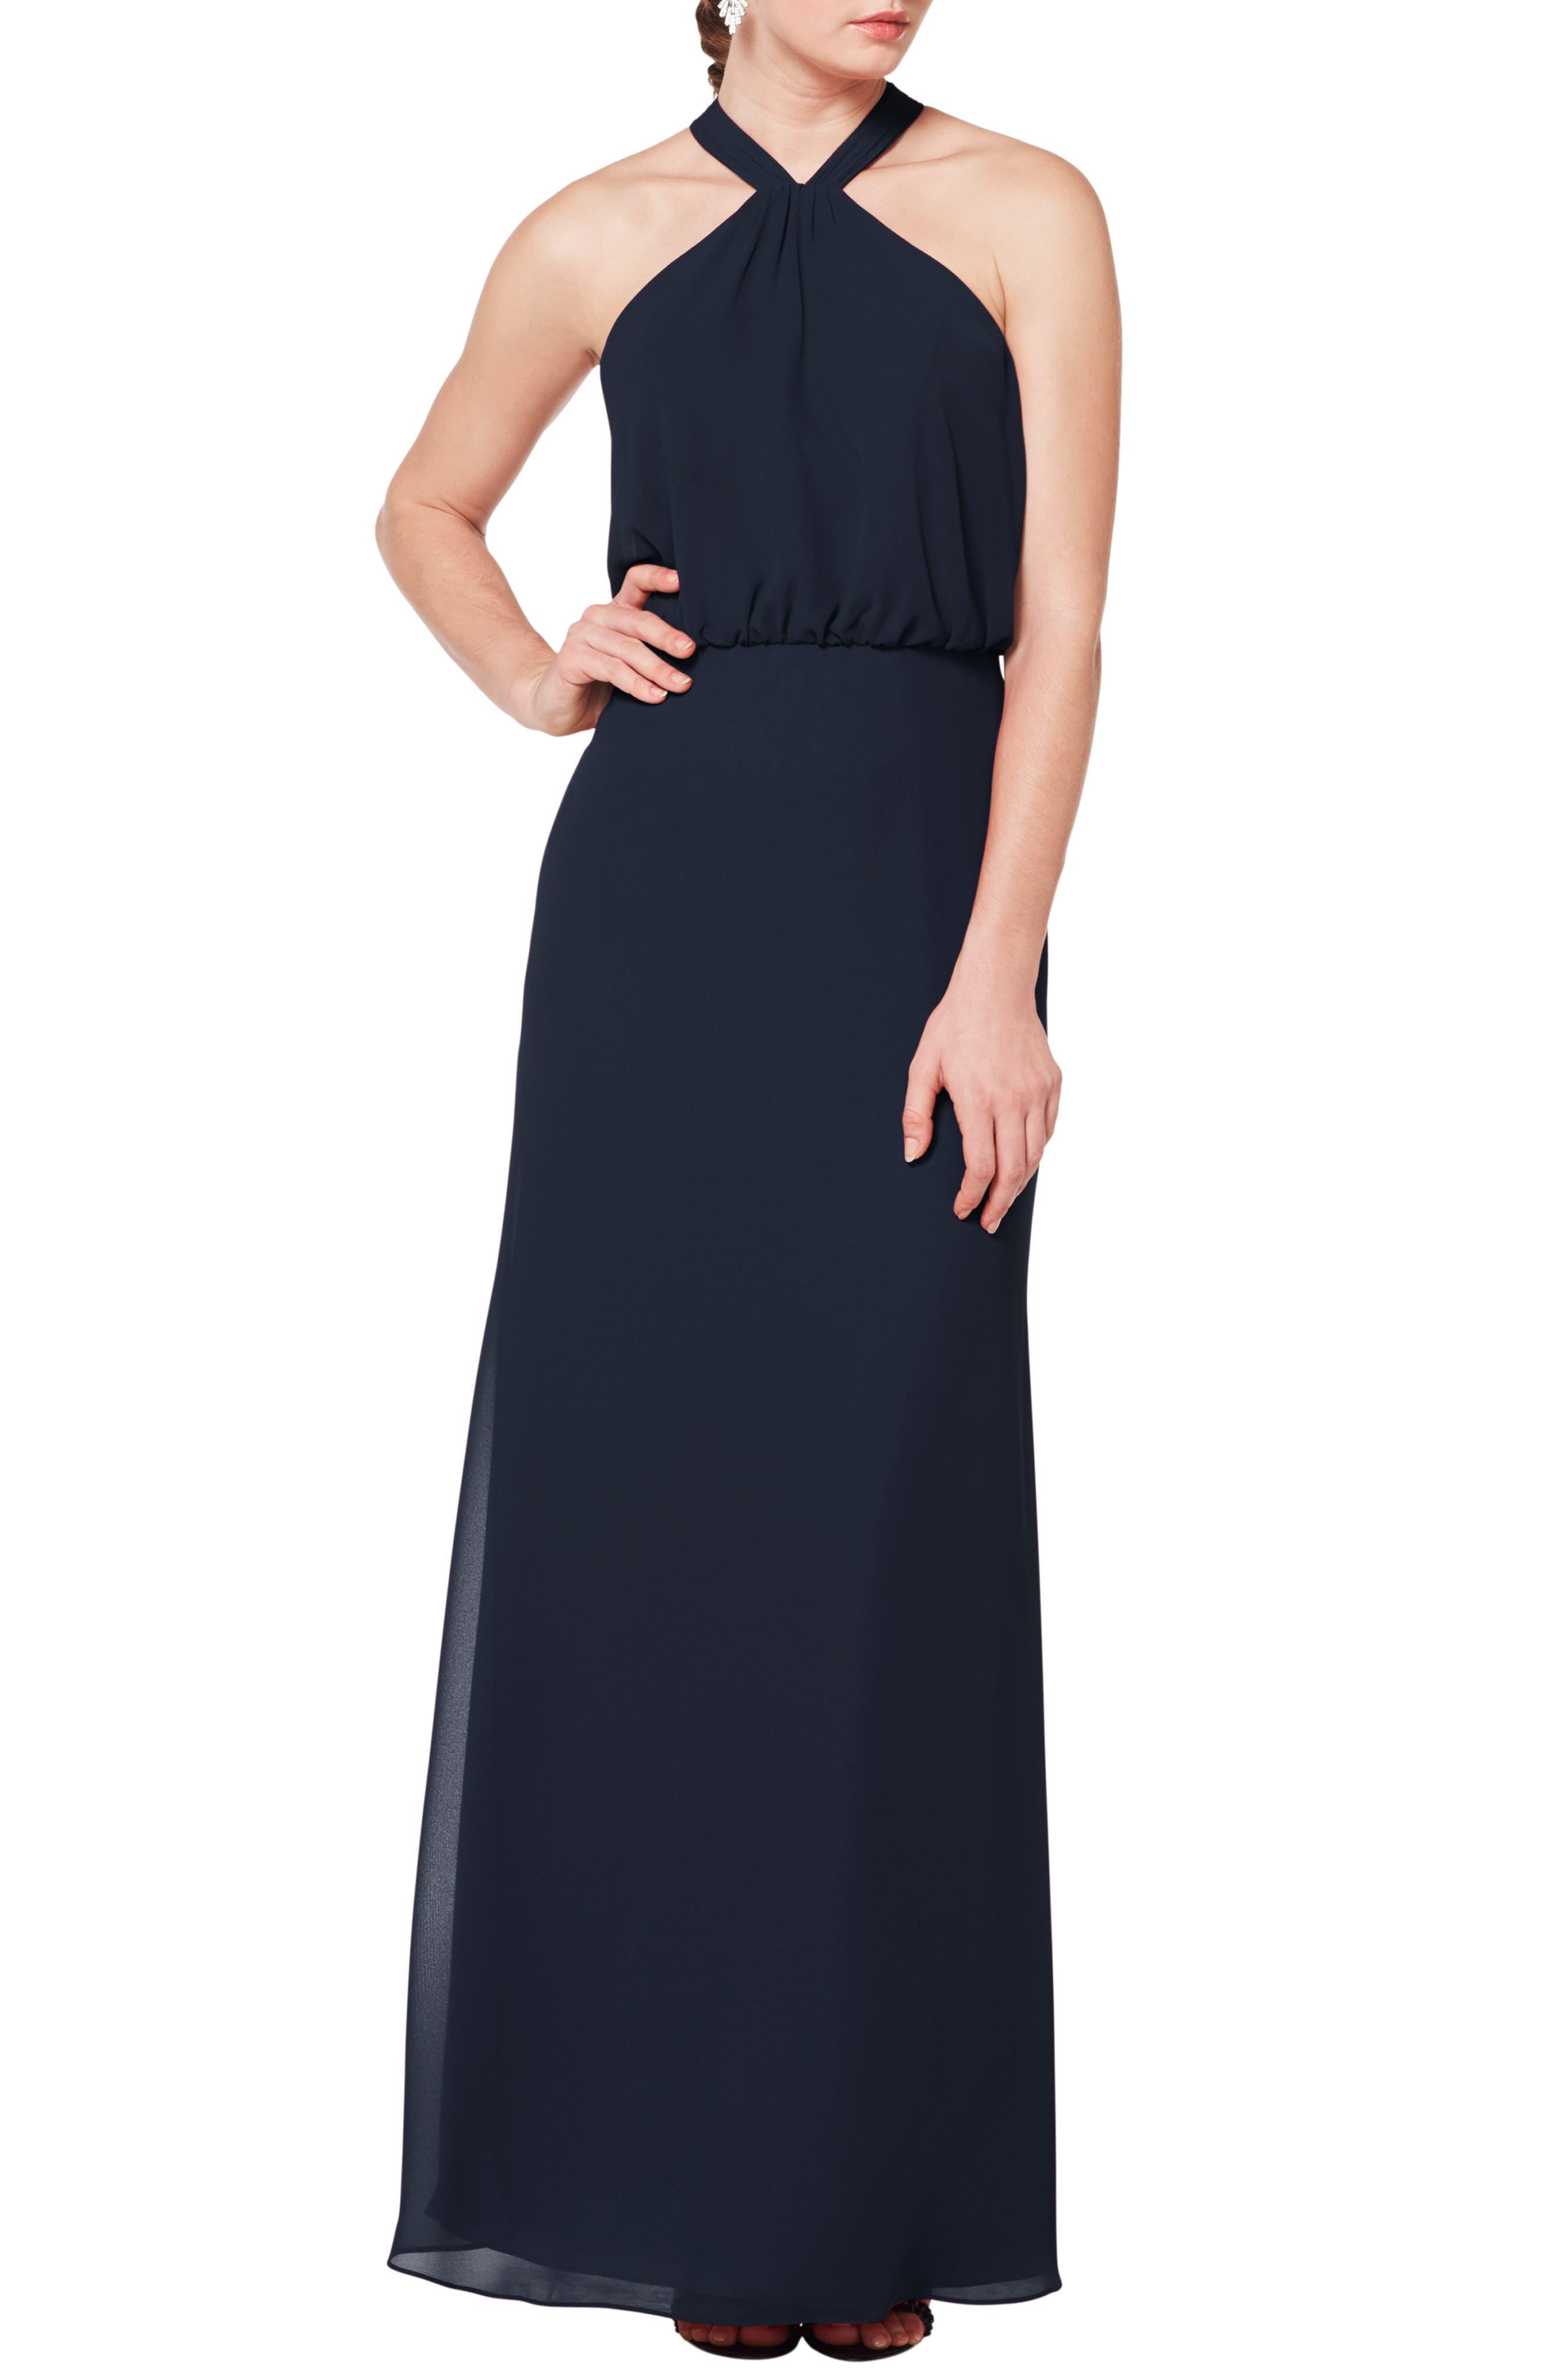 #LEVKOFF, Halter Neck Blouson Bodice Evening Dress, Main thumbnail 1, color, NAVY